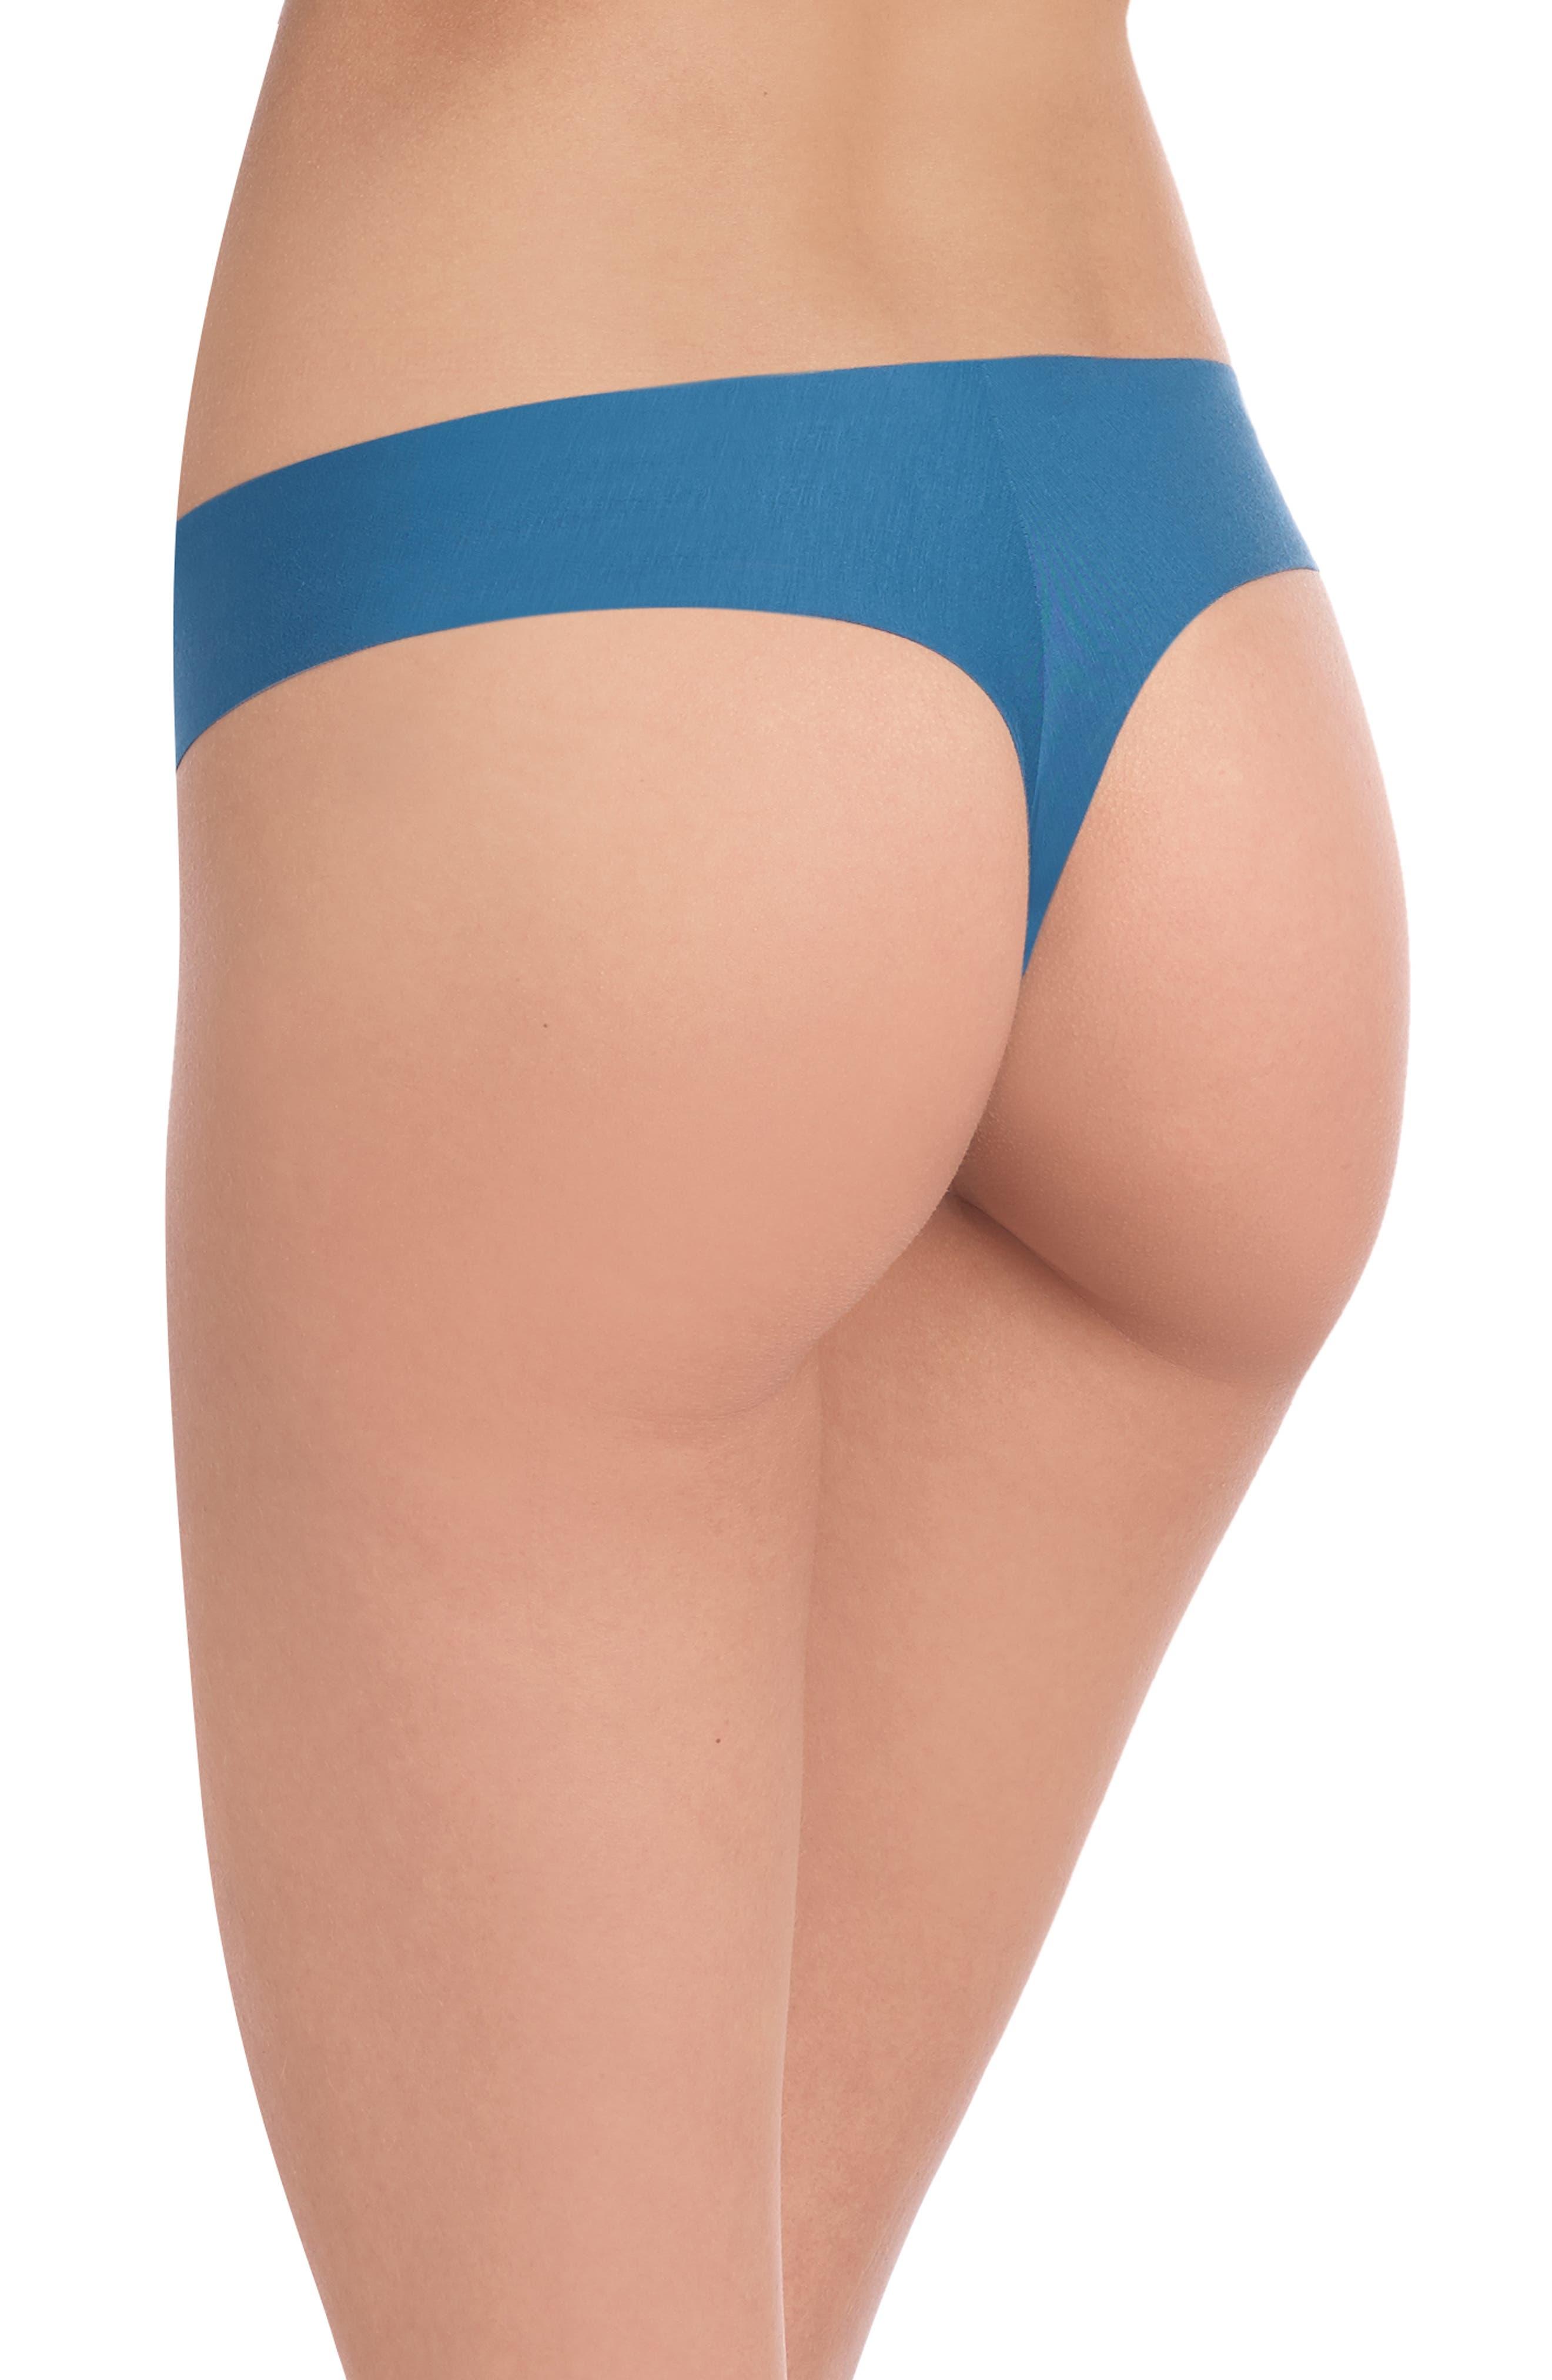 'Butter' Stretch Modal Thong,                             Alternate thumbnail 2, color,                             THAI BLUE